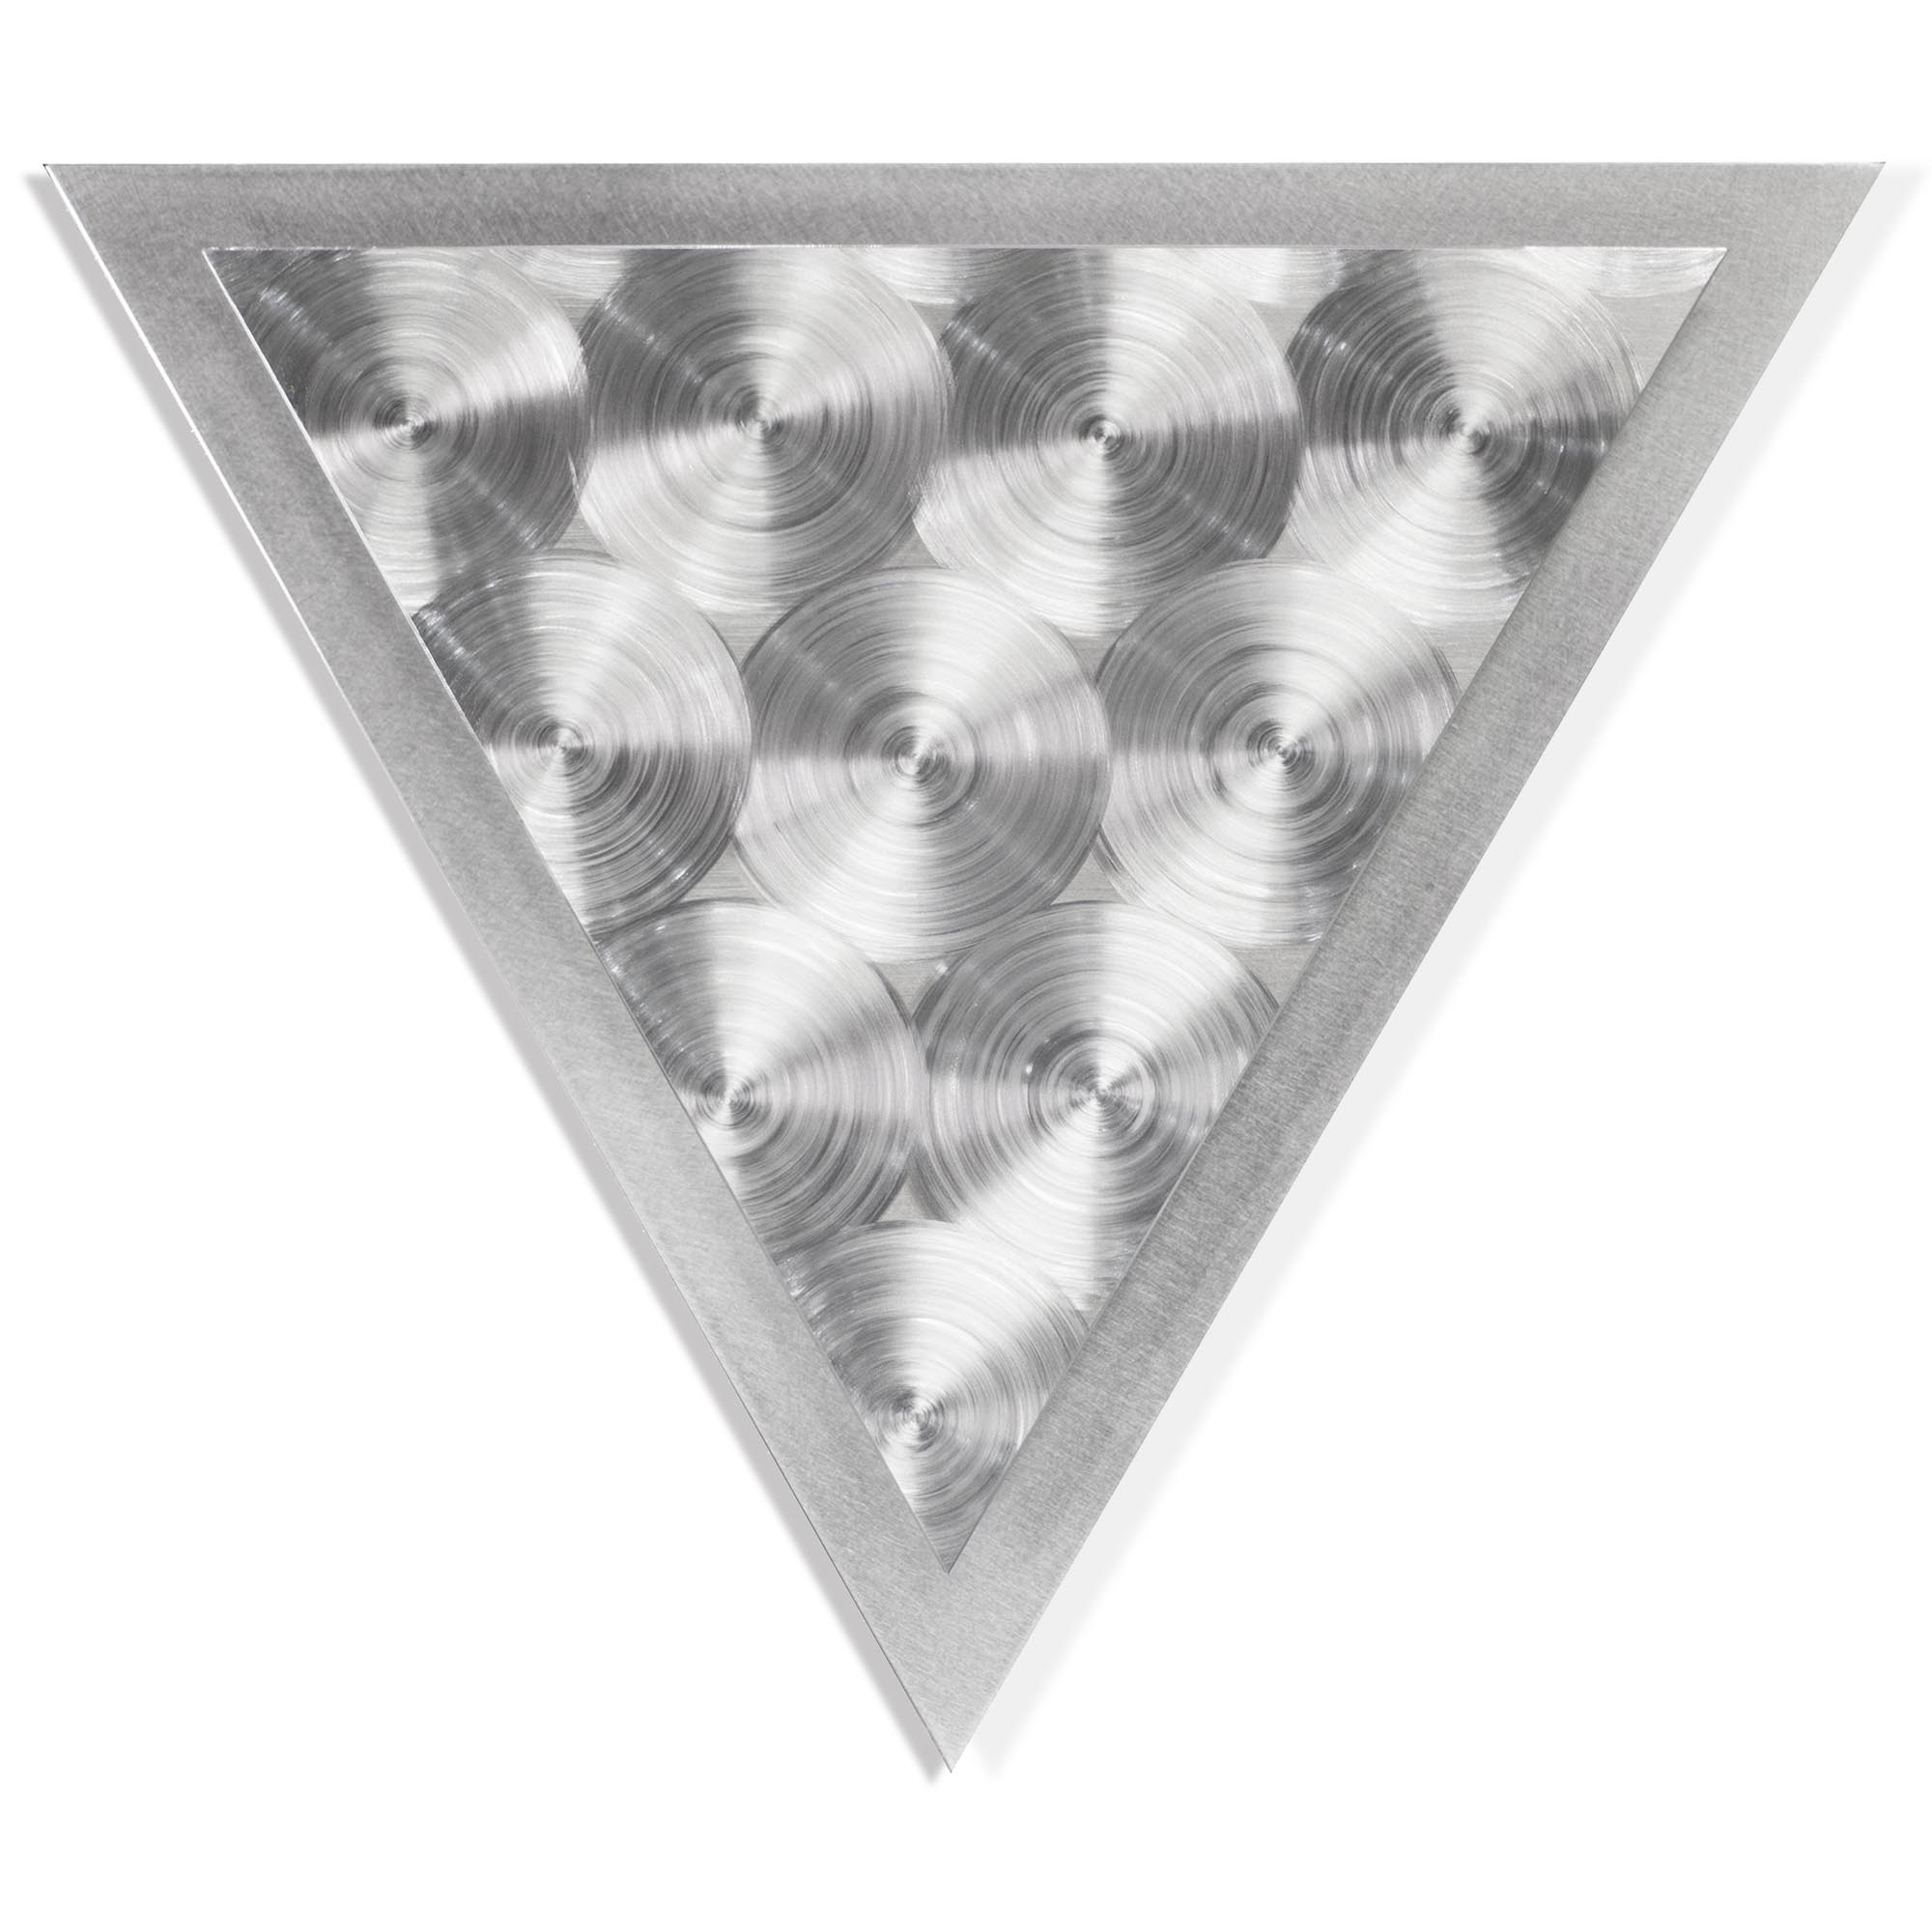 Helena Martin 'Discs Angle' 15in x 13in Modern Metal Art on Ground Metal